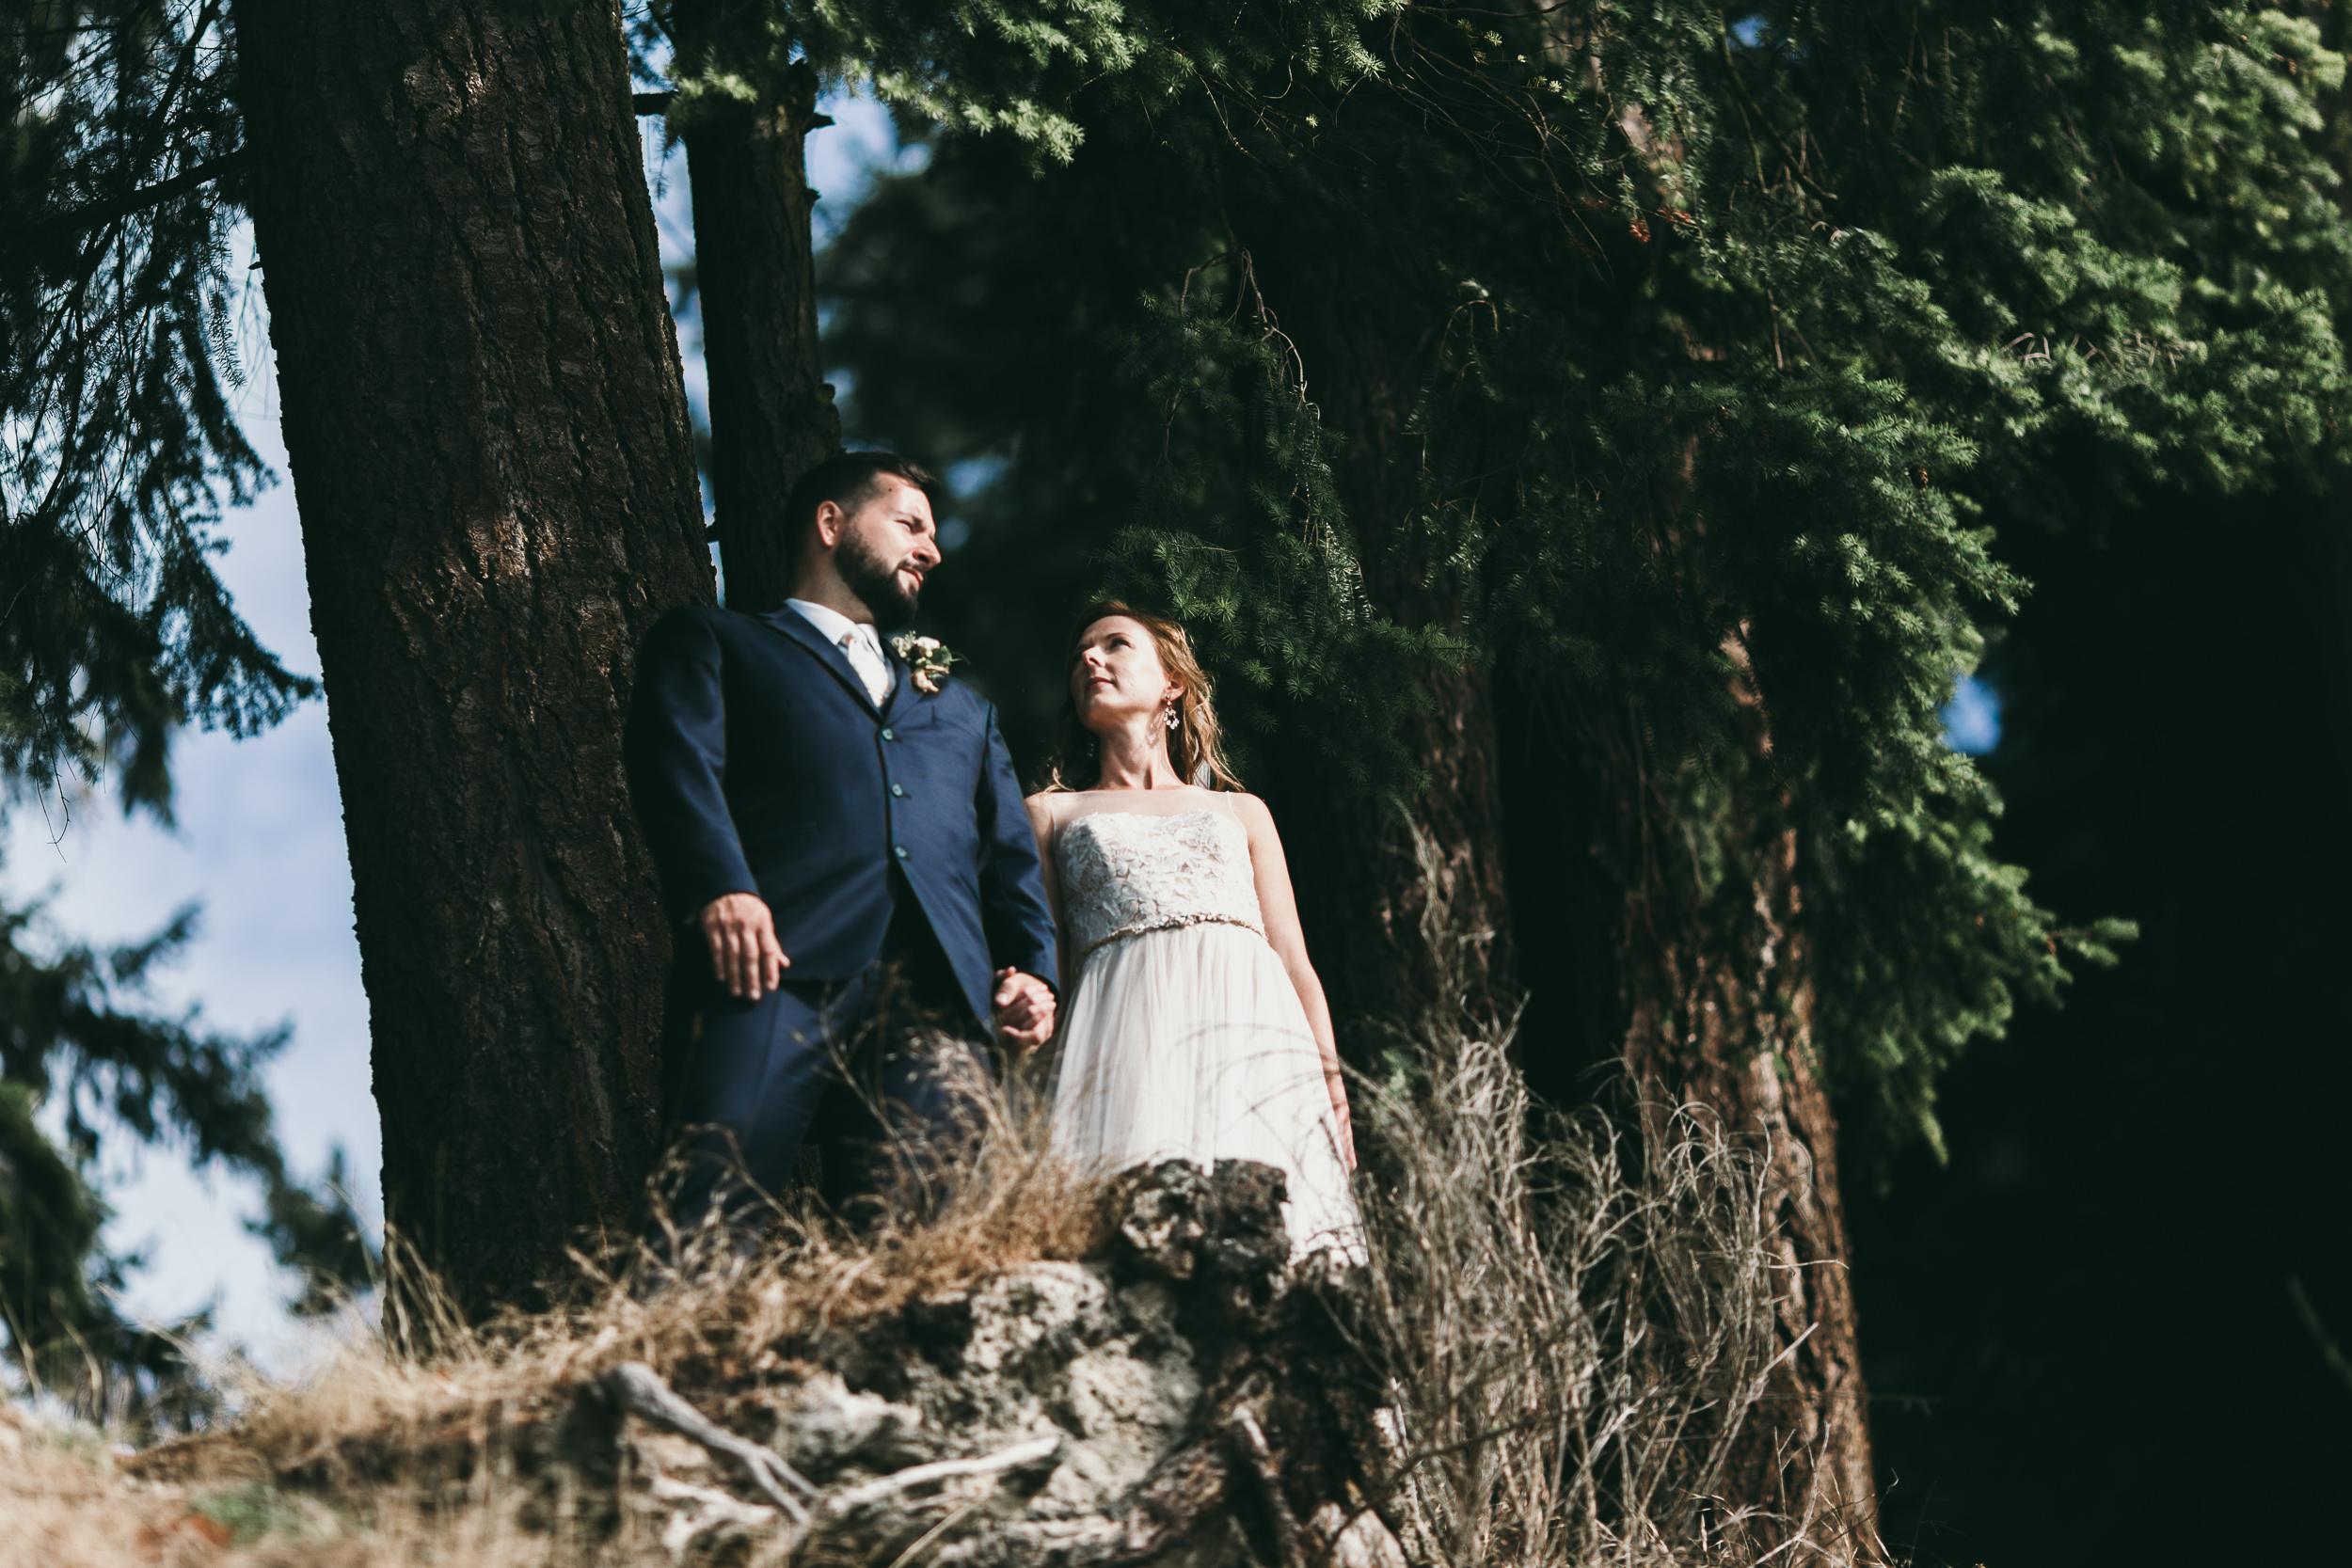 bride and groom look majestic on precipice